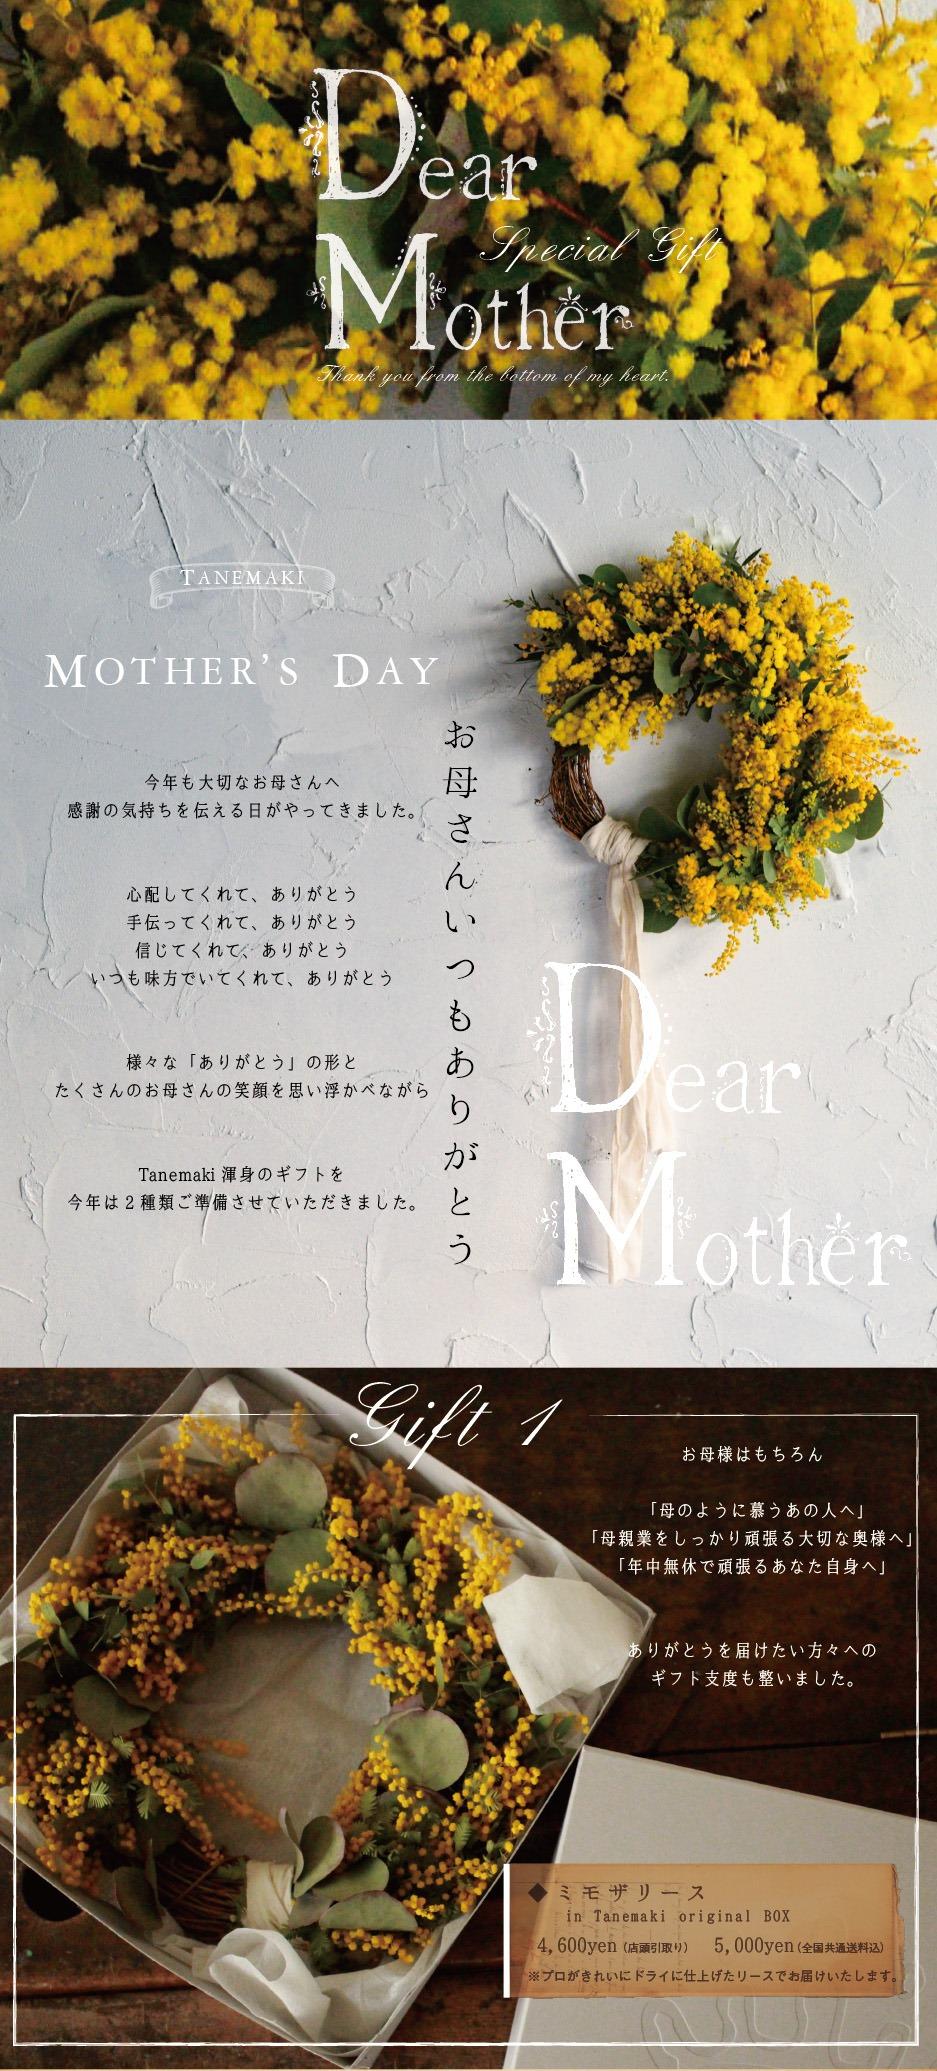 2018_MothersDay_01-1.jpg